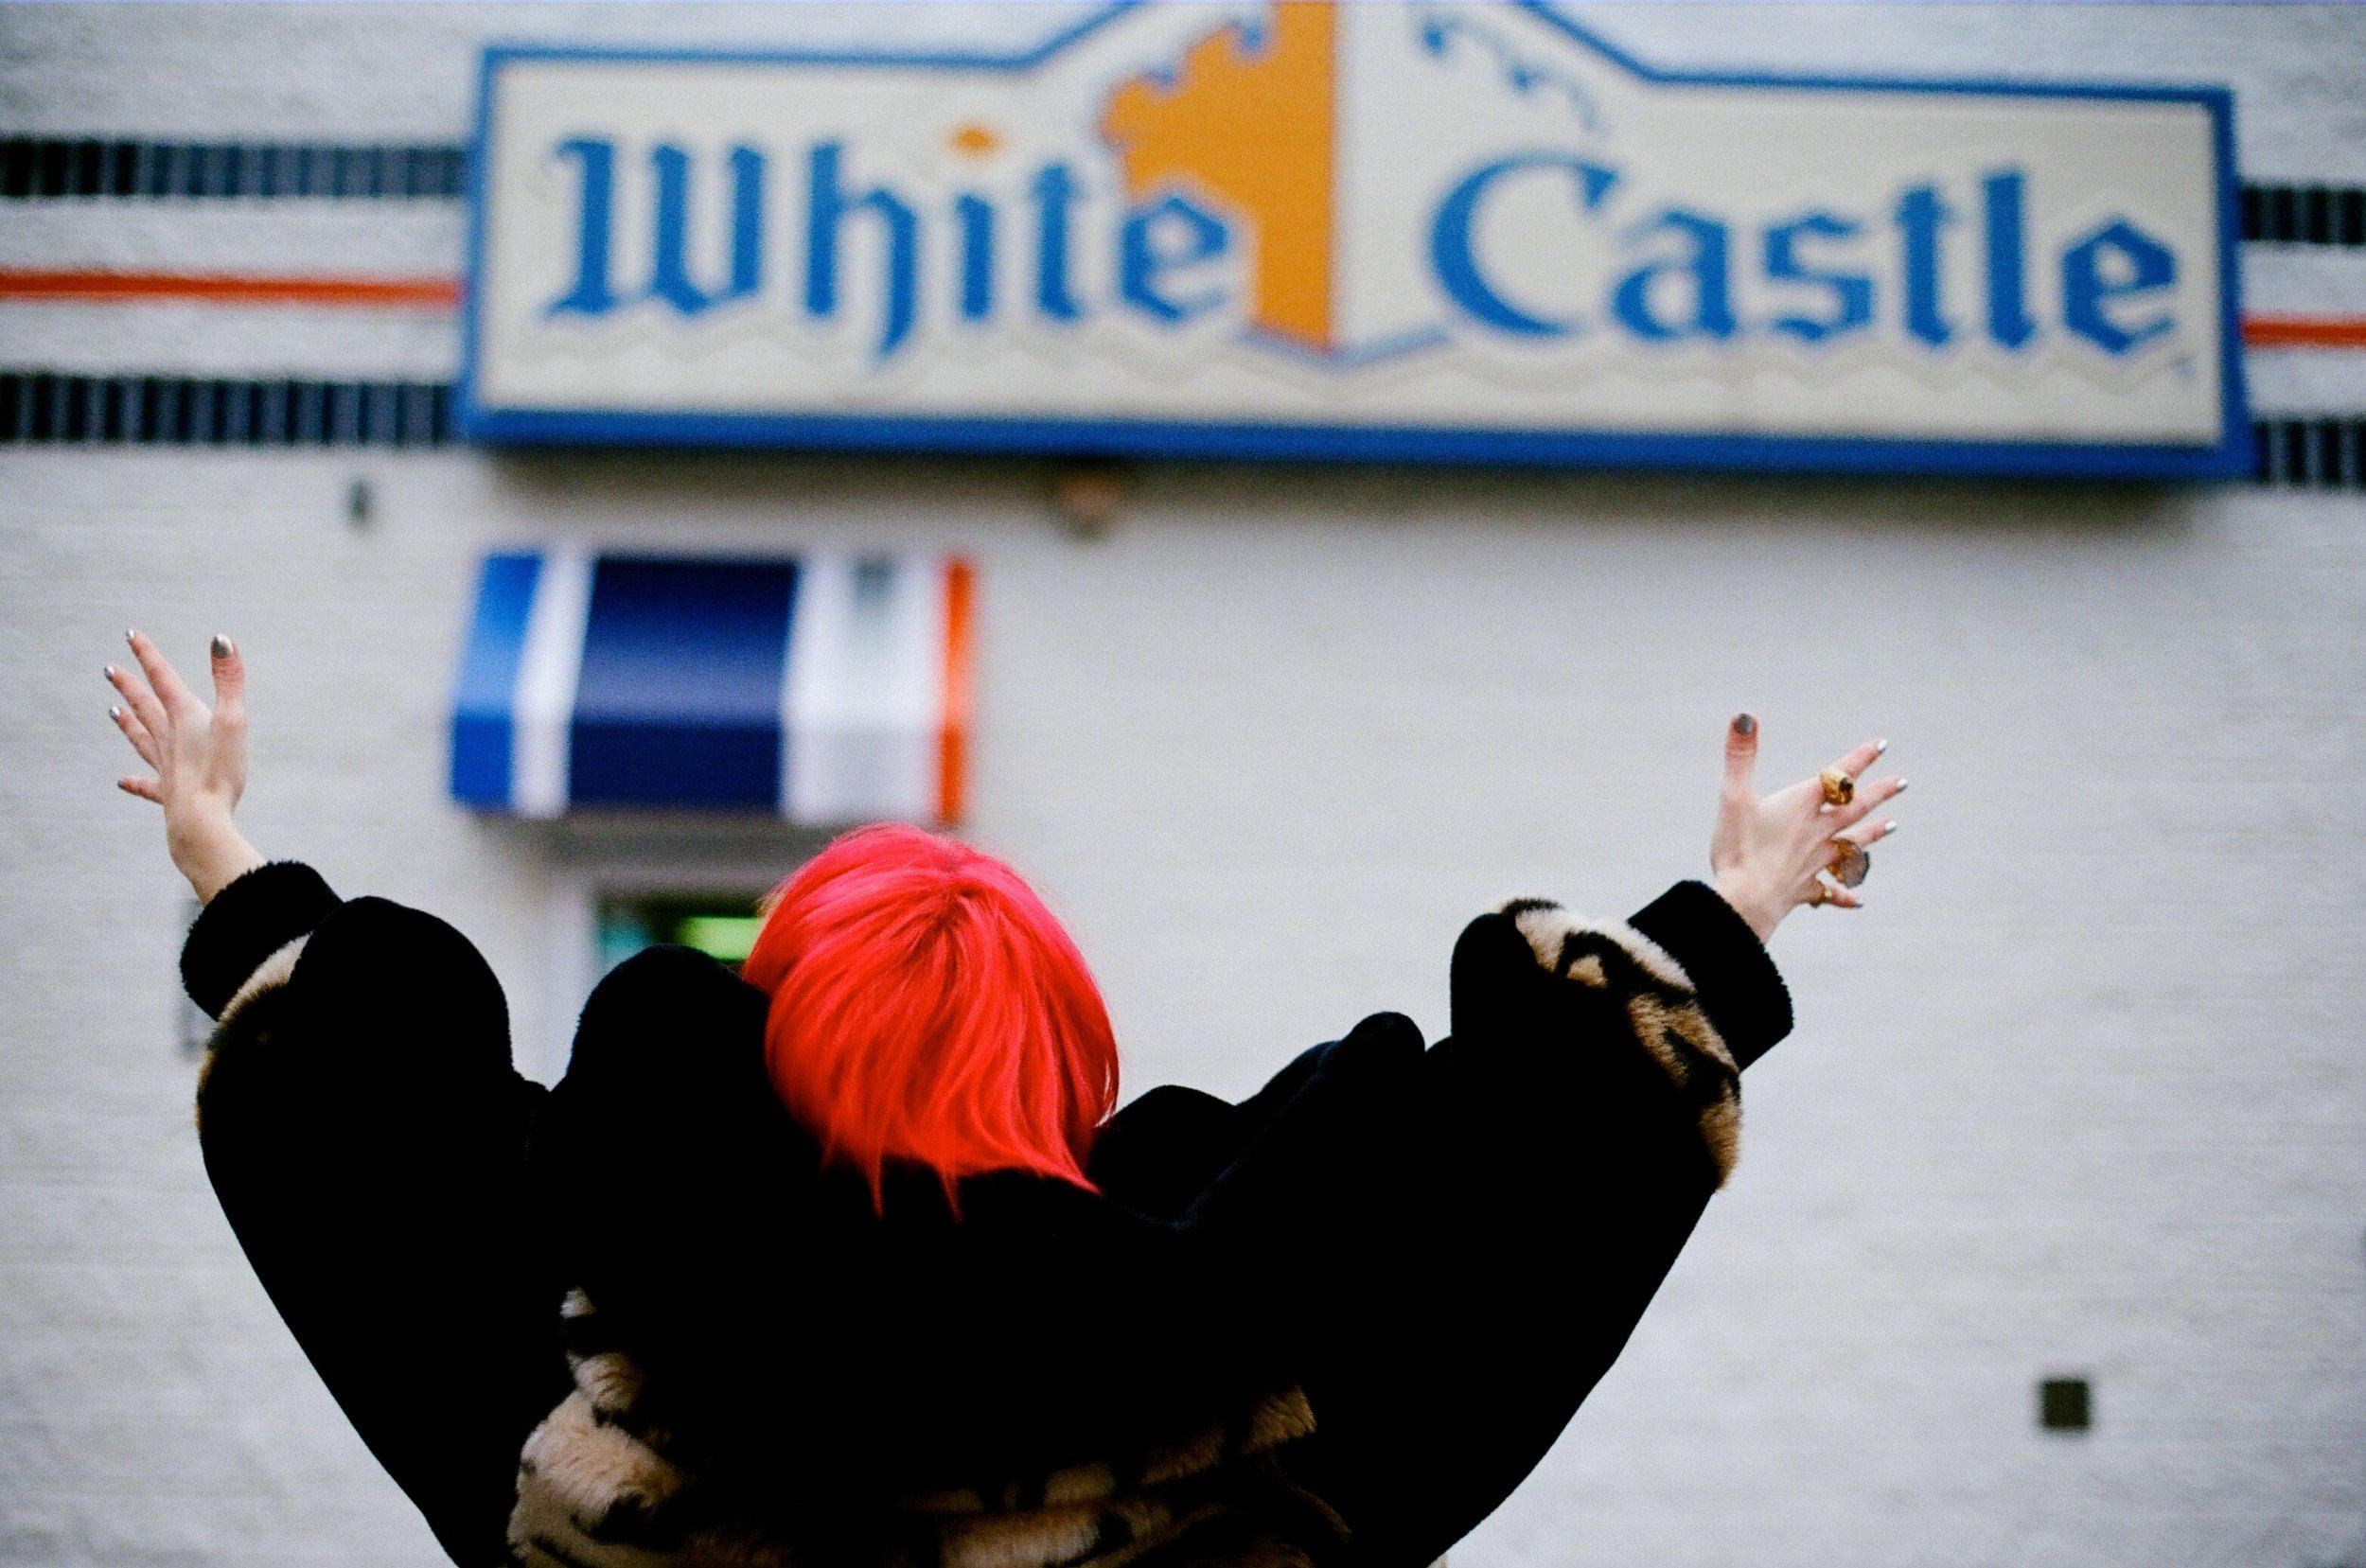 scarlet-bob-queen-of-white-castle